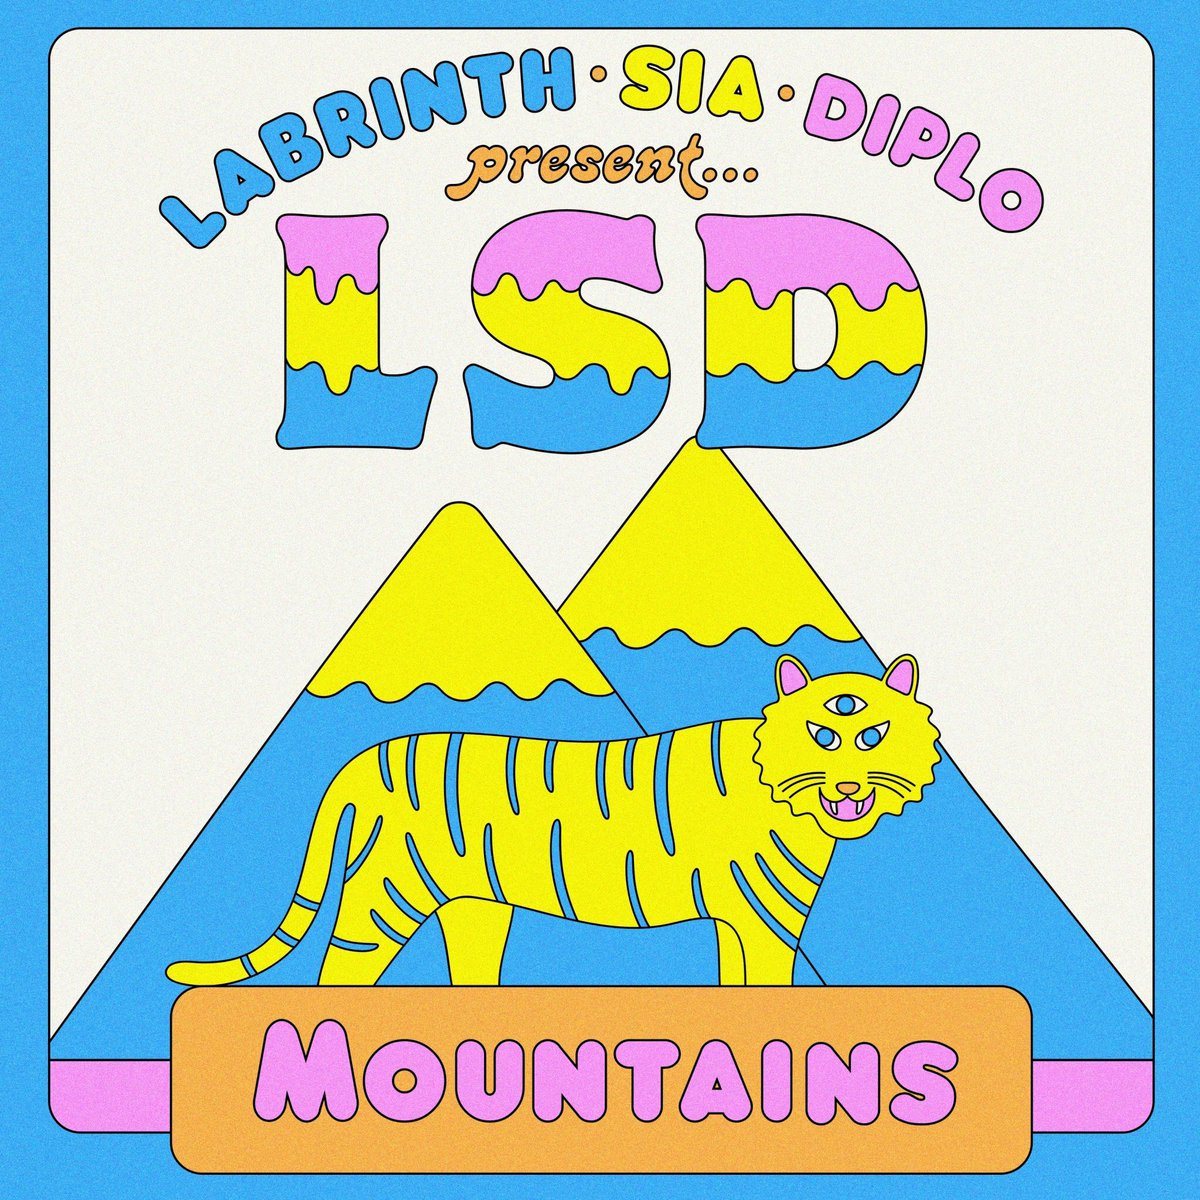 RT @diplo: tune in @beats1 w/ @ZaneLowe at 12pm et #Mountains ????️ https://t.co/G1clKsy5AX https://t.co/VYoBqRNDoq